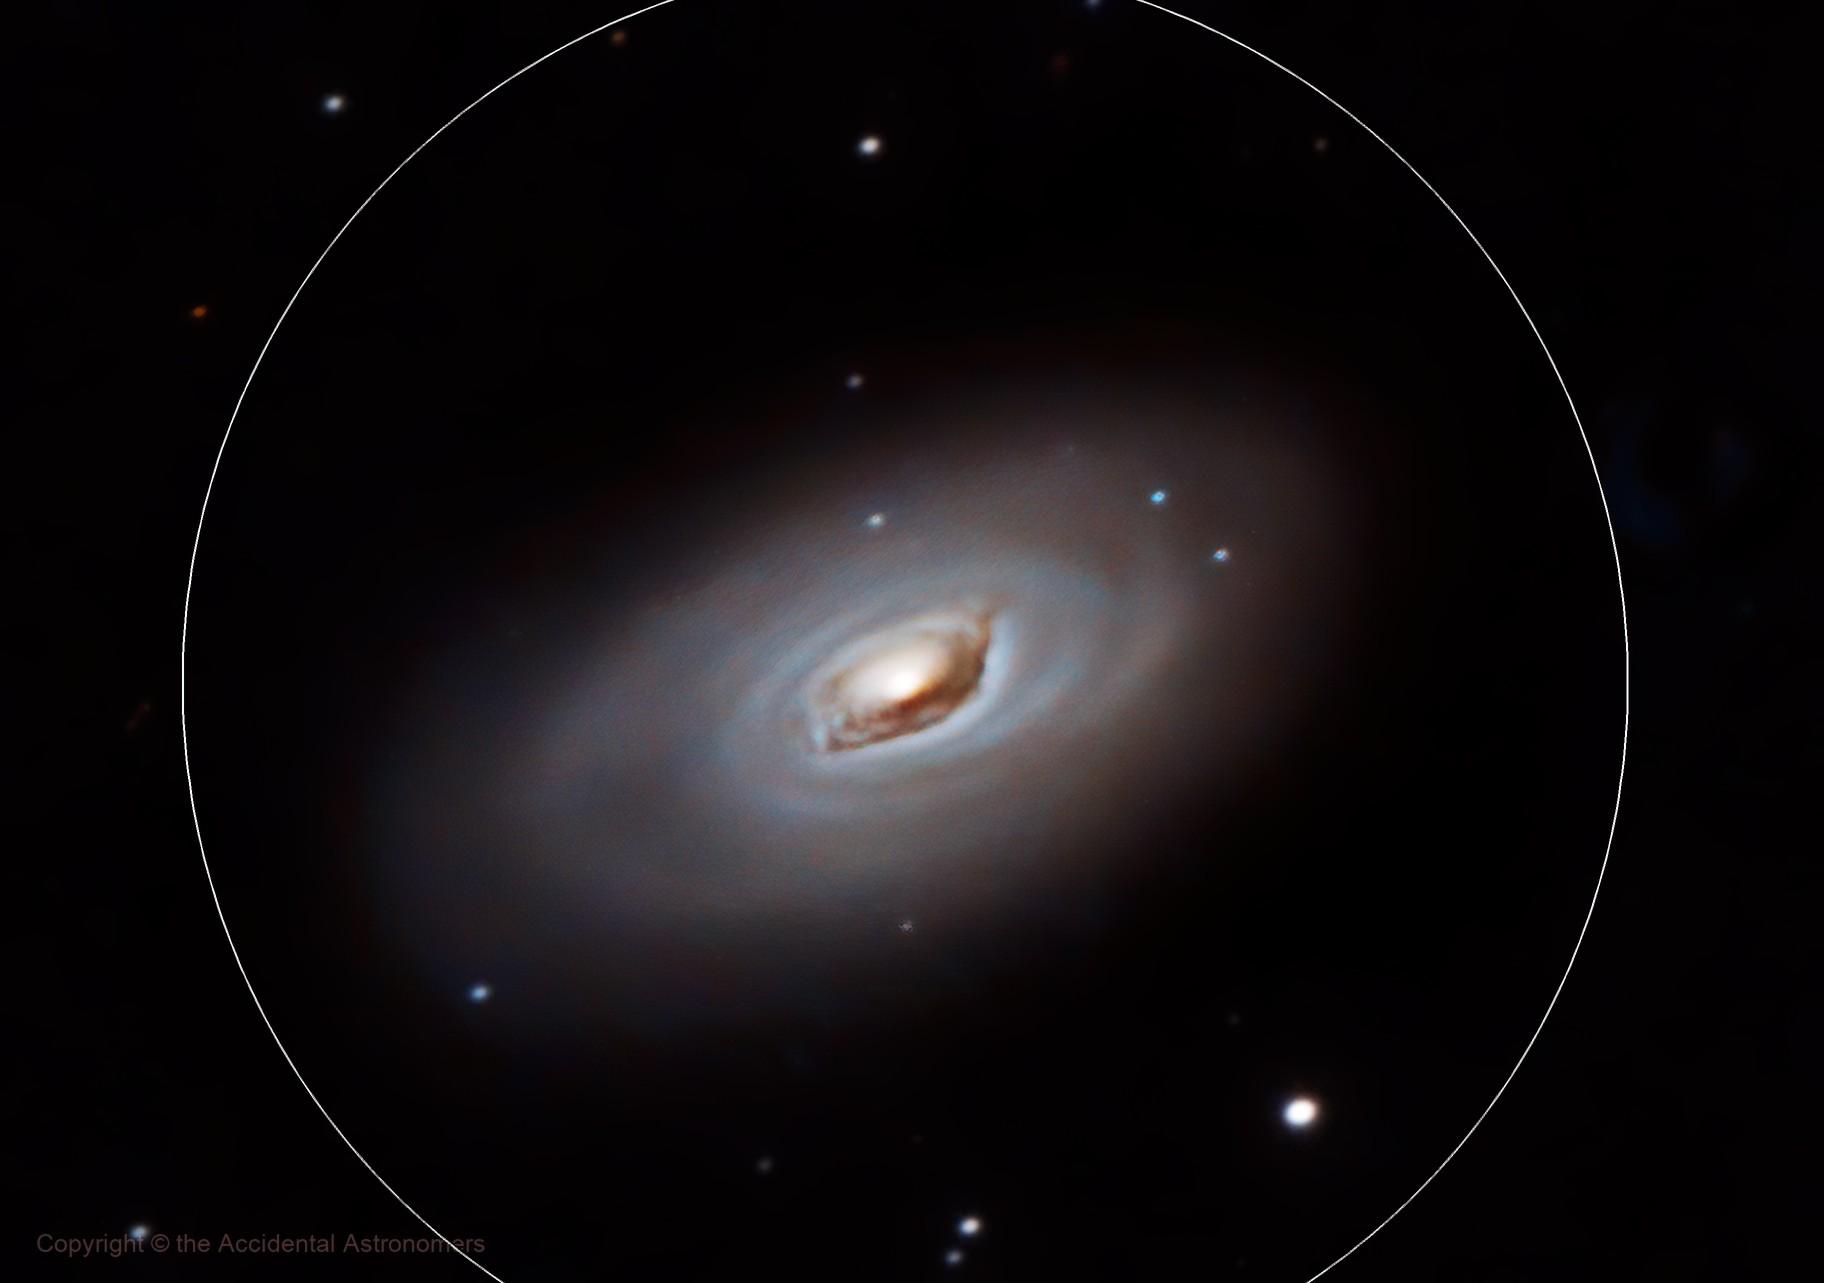 Messier 64 - The Black Eye Galaxy - Full Moon Galaxy Quest Part 3